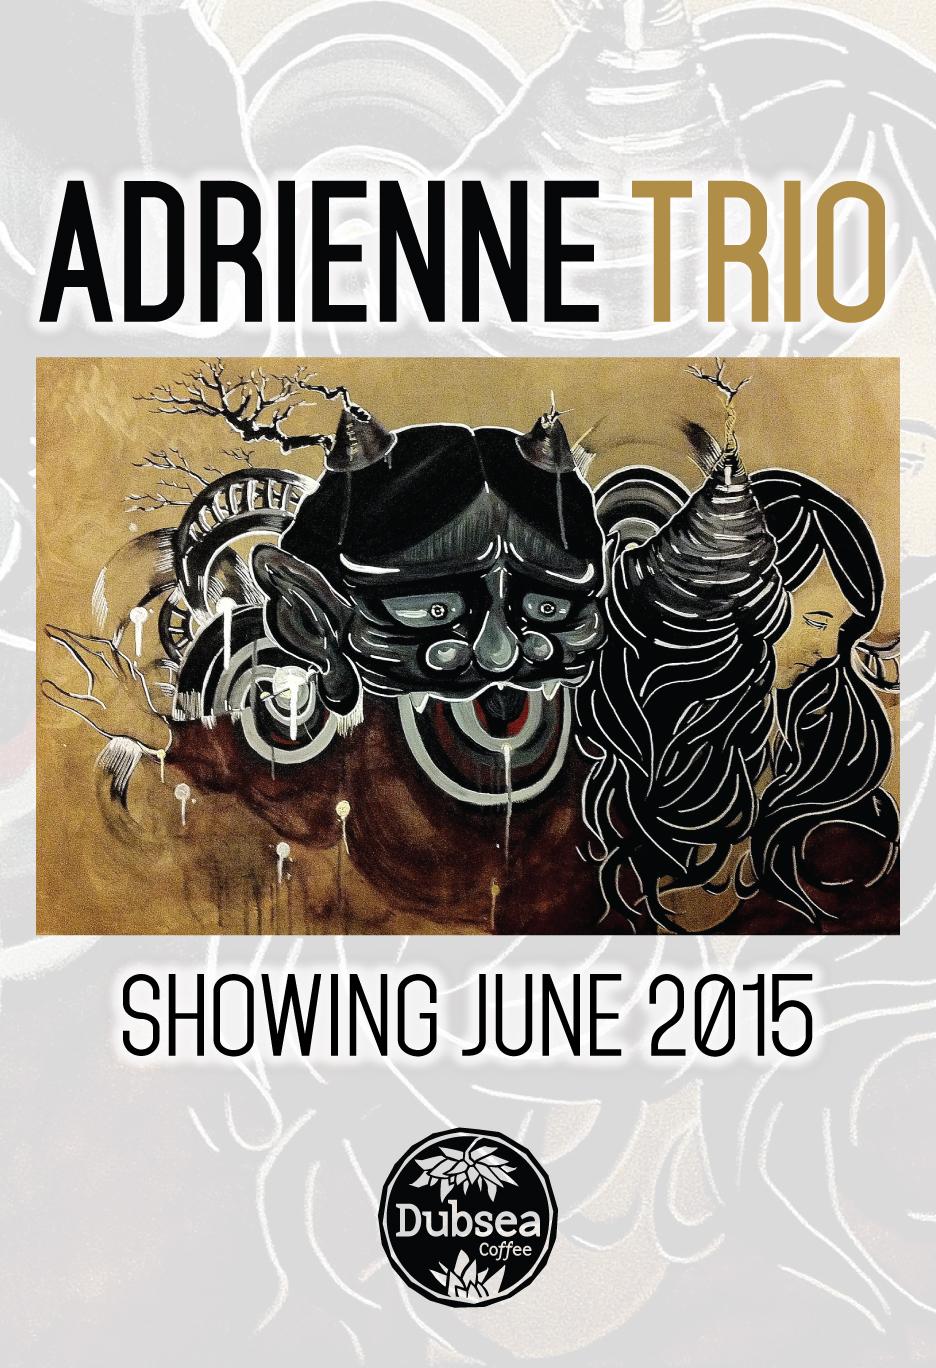 AdrienneTrio_Poster.jpg